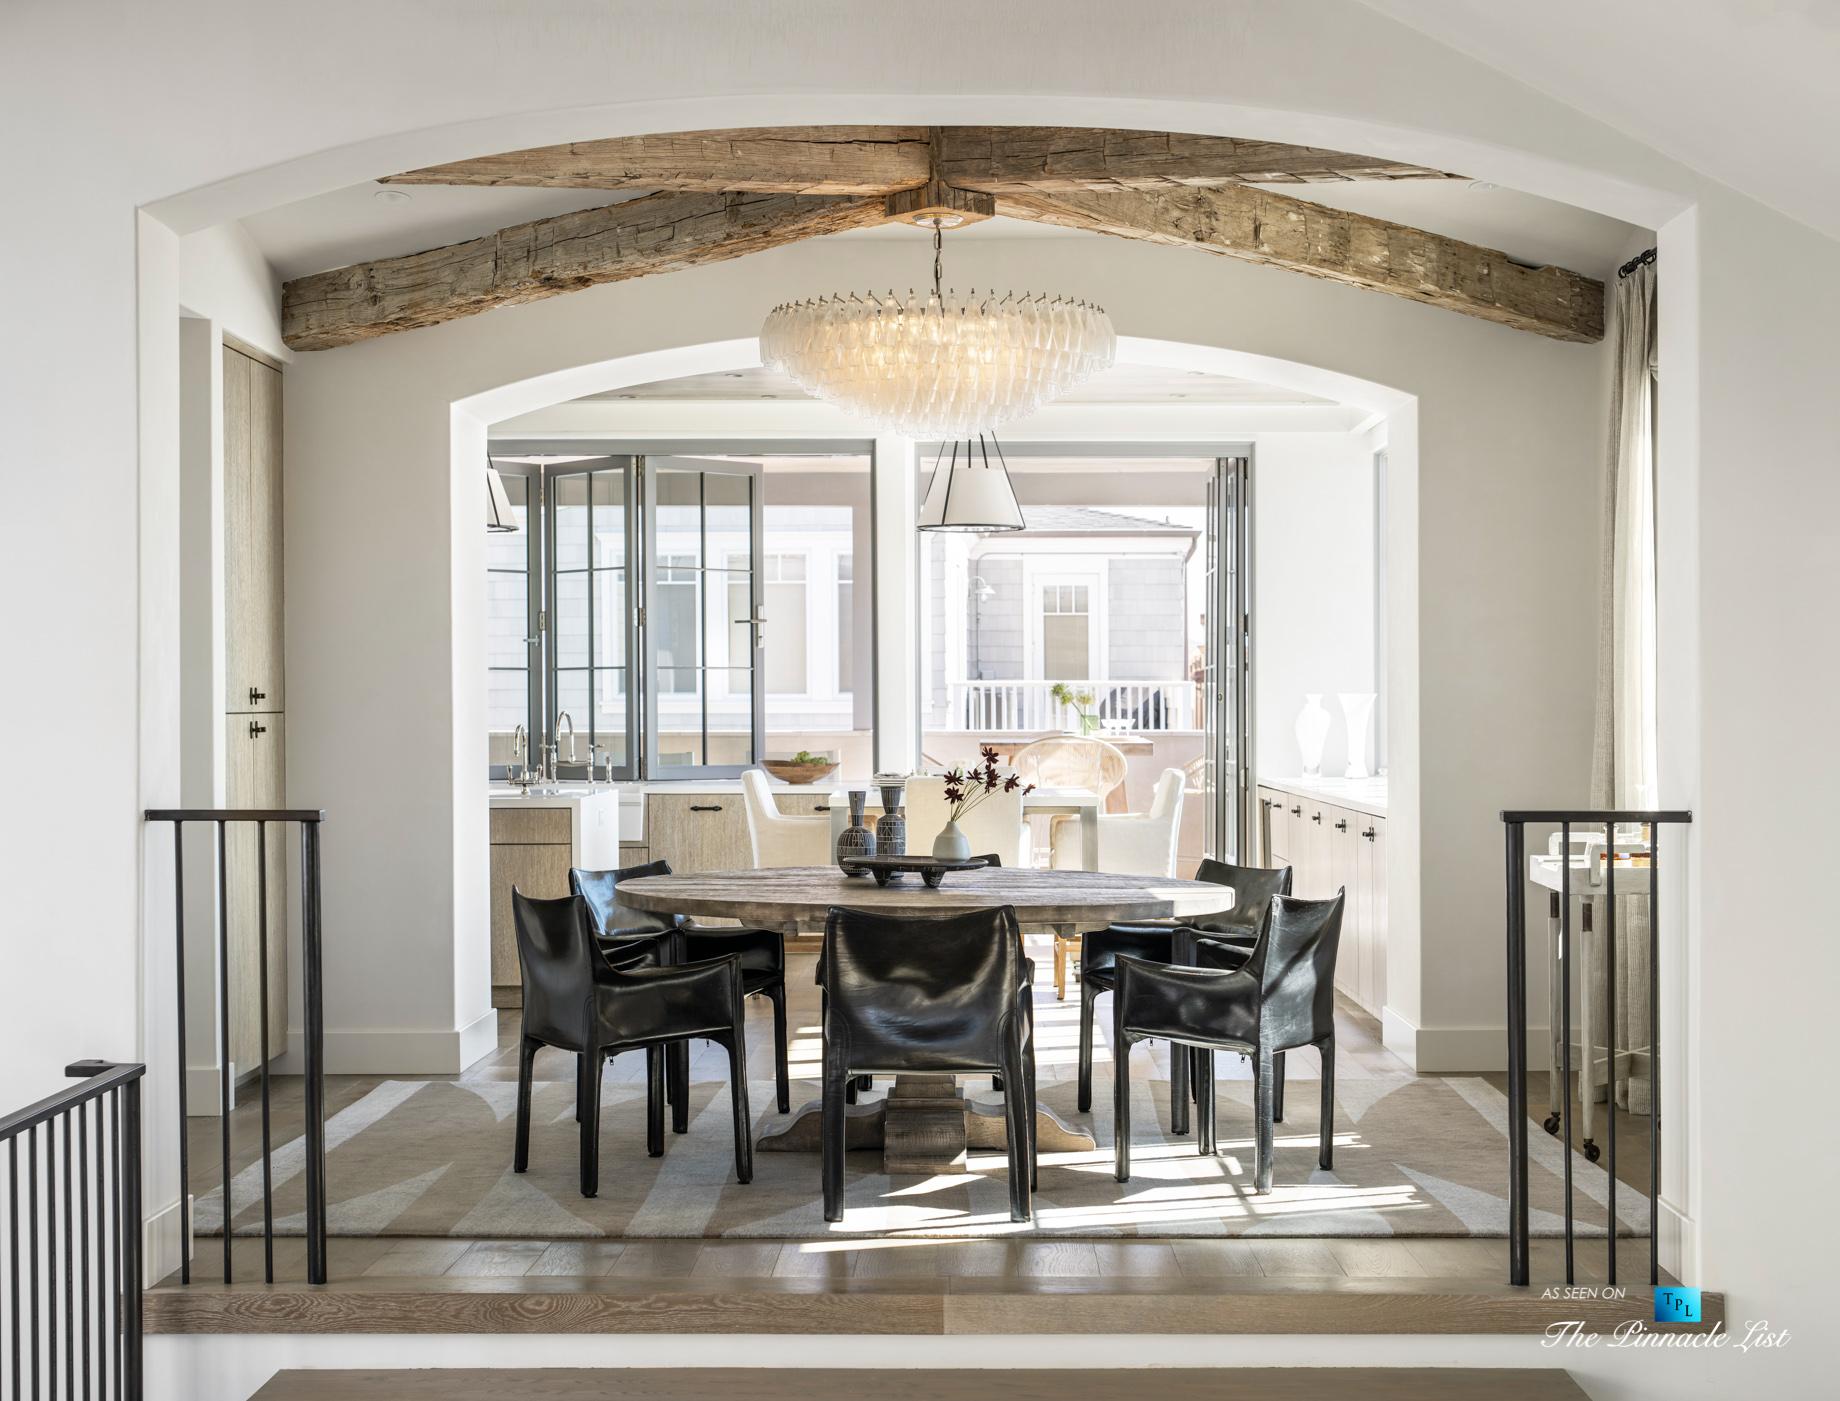 Exquisite Luxury Walk Street Home – 220 8th St, Manhattan Beach, CA, USA – Dining Room